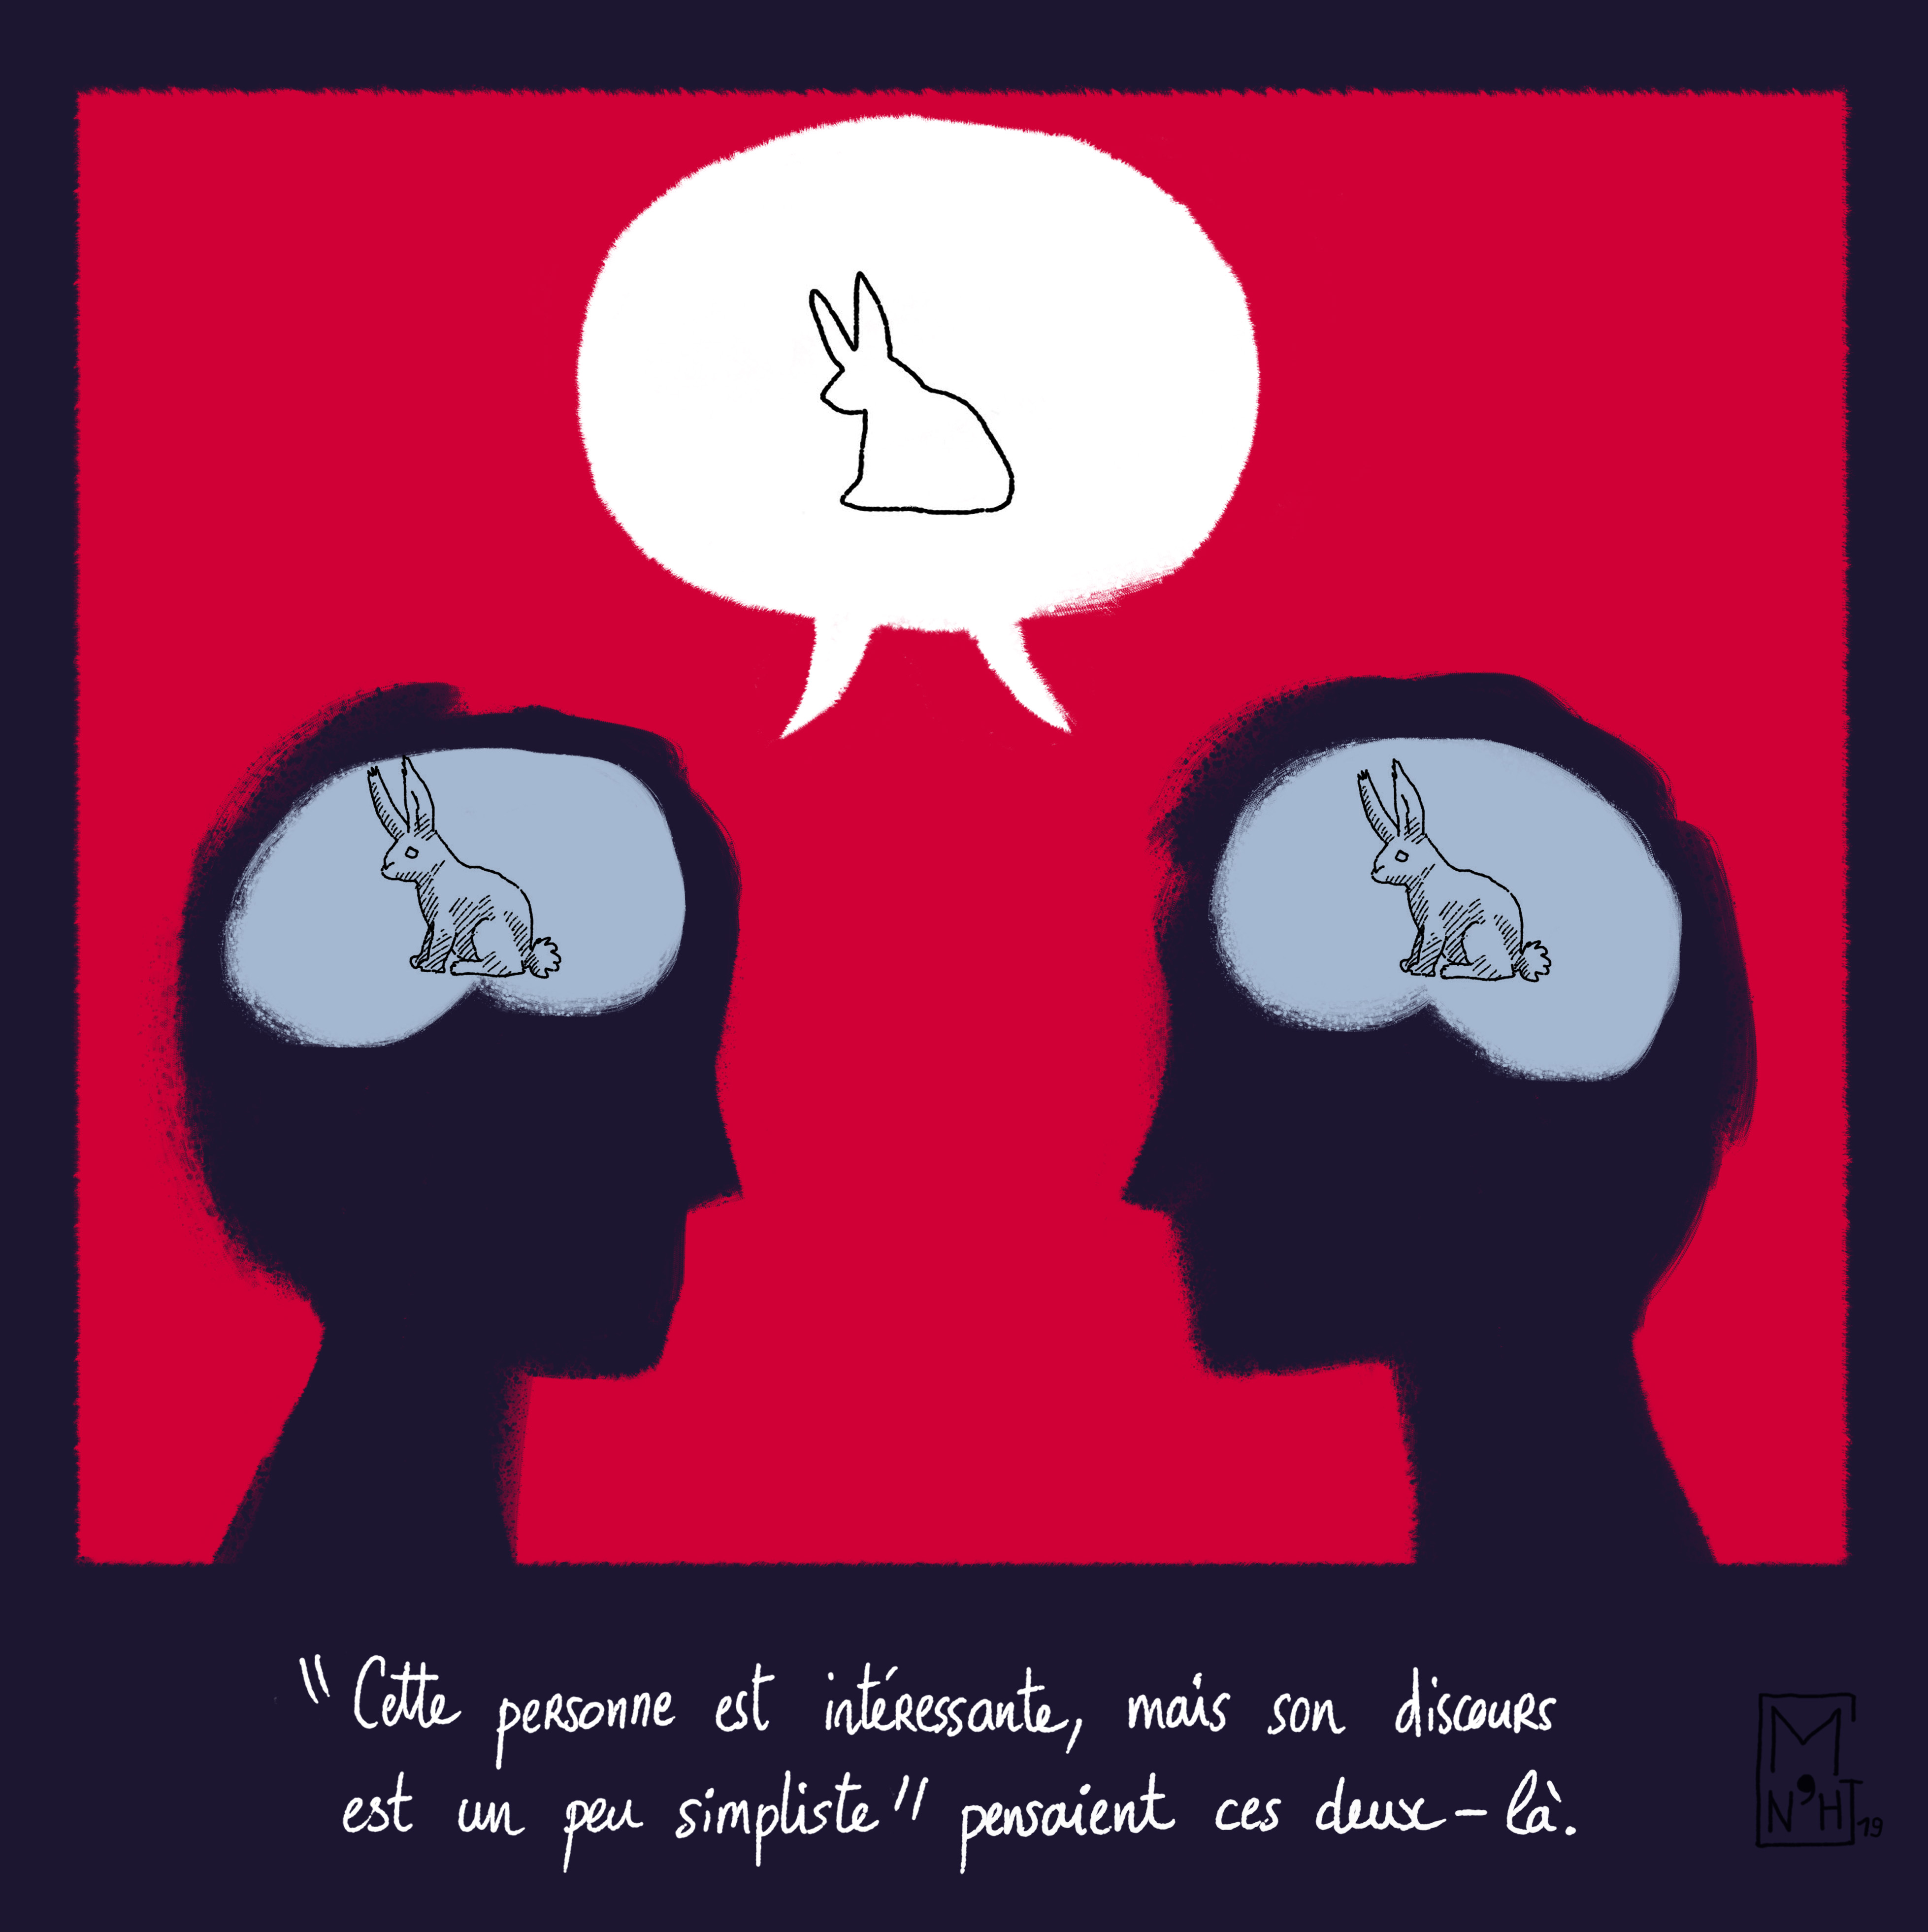 illustration symbolique et philosophique.